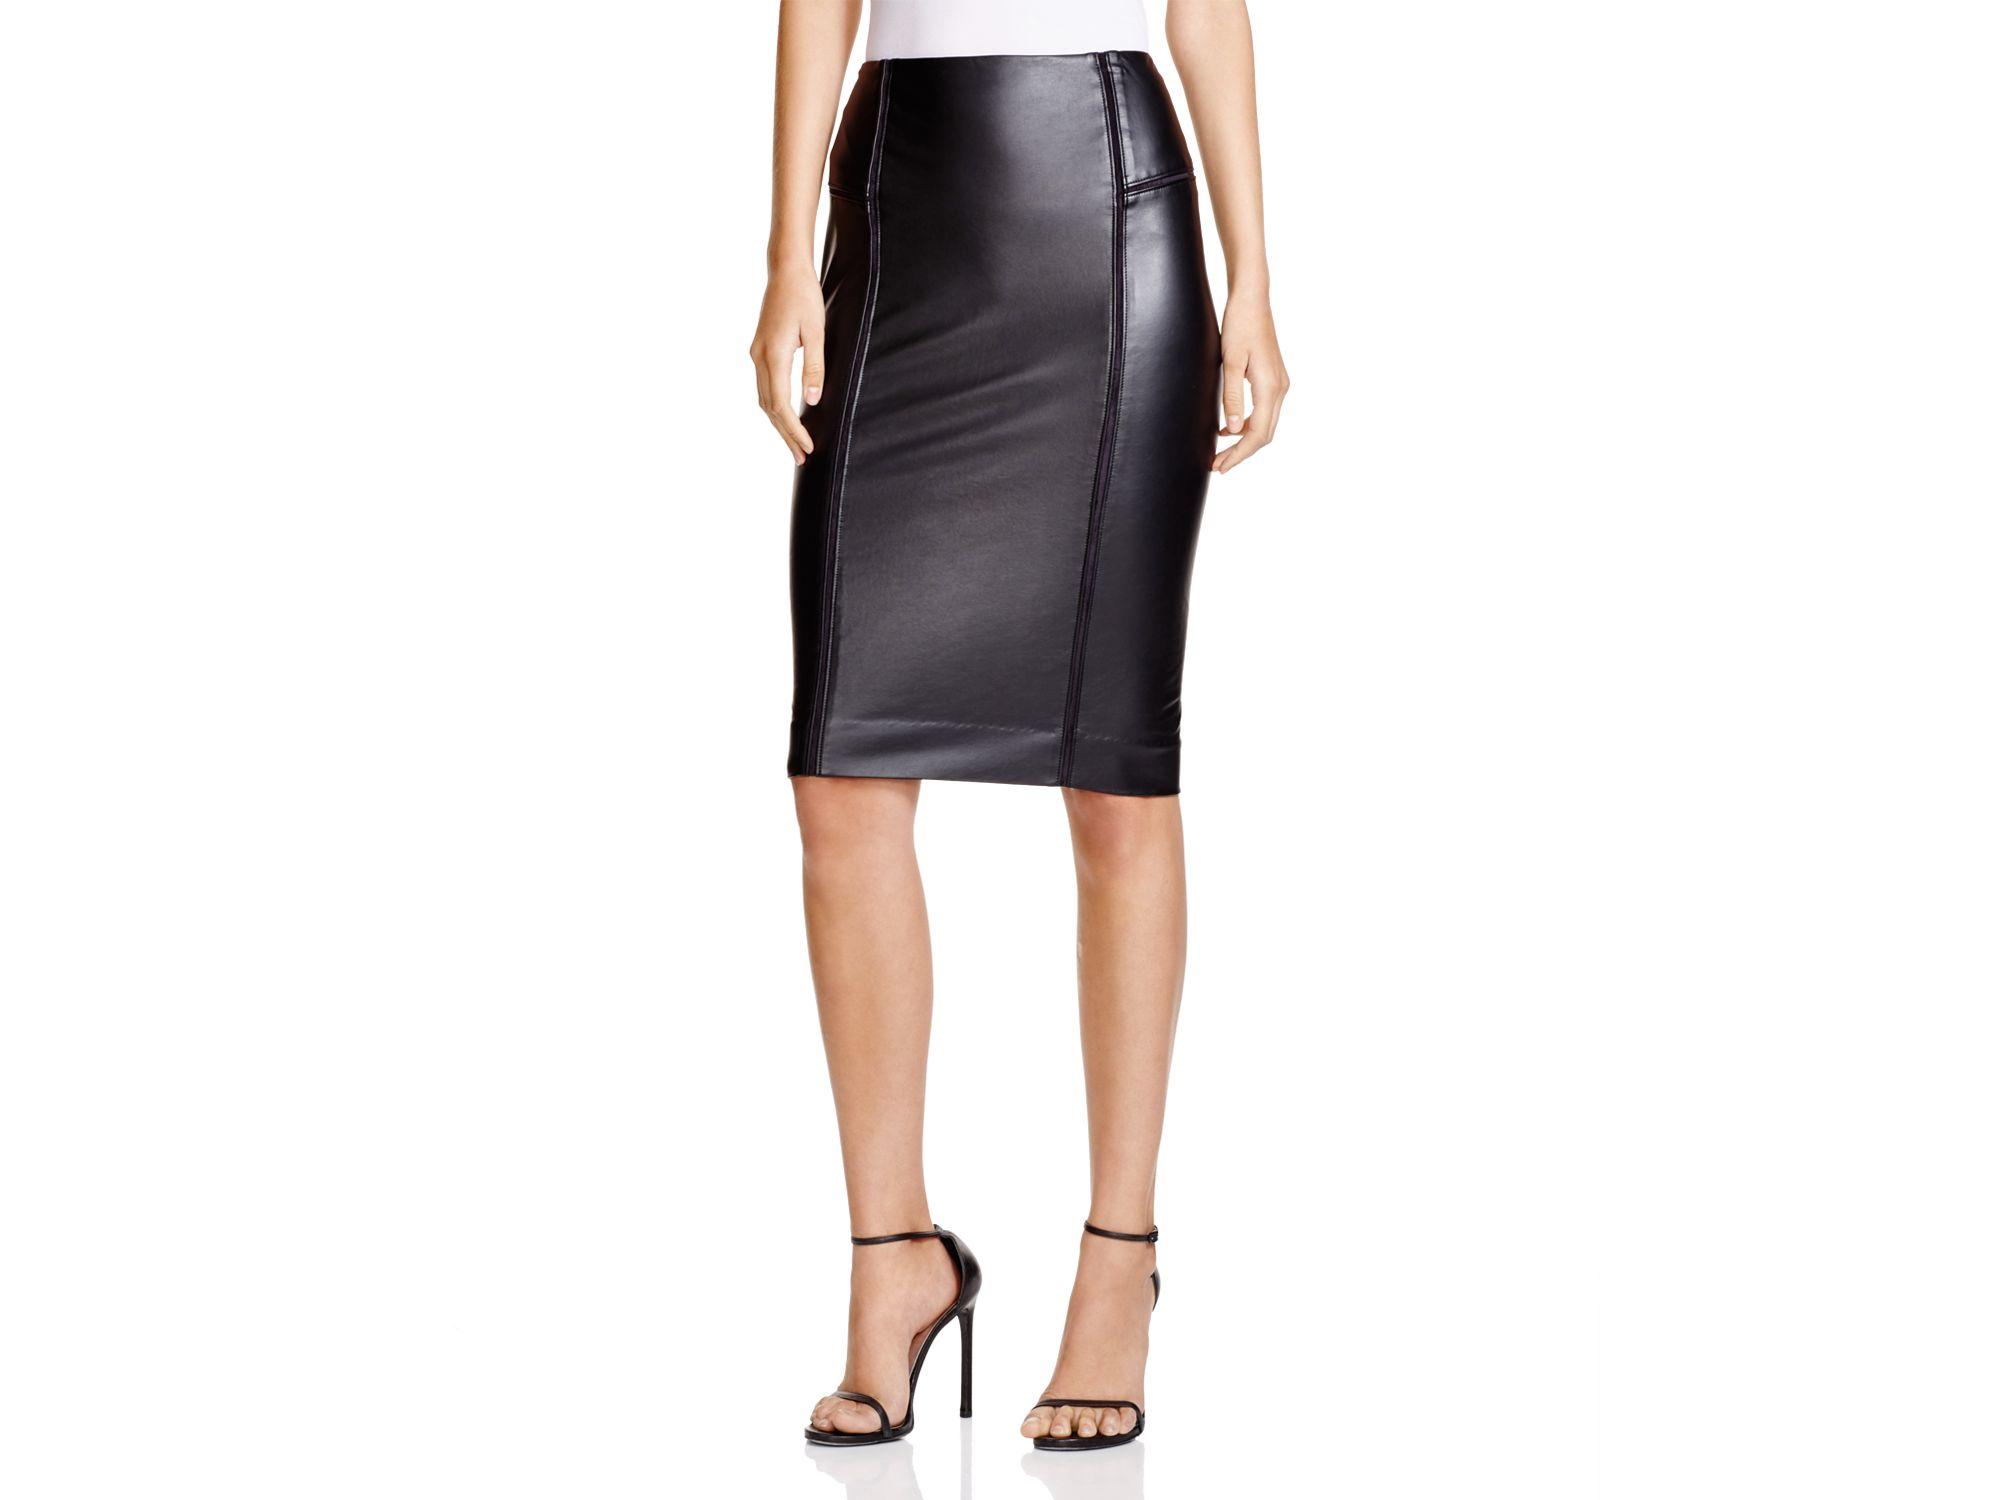 Lyssé Faux Leather Pencil Skirt in Black | Lyst